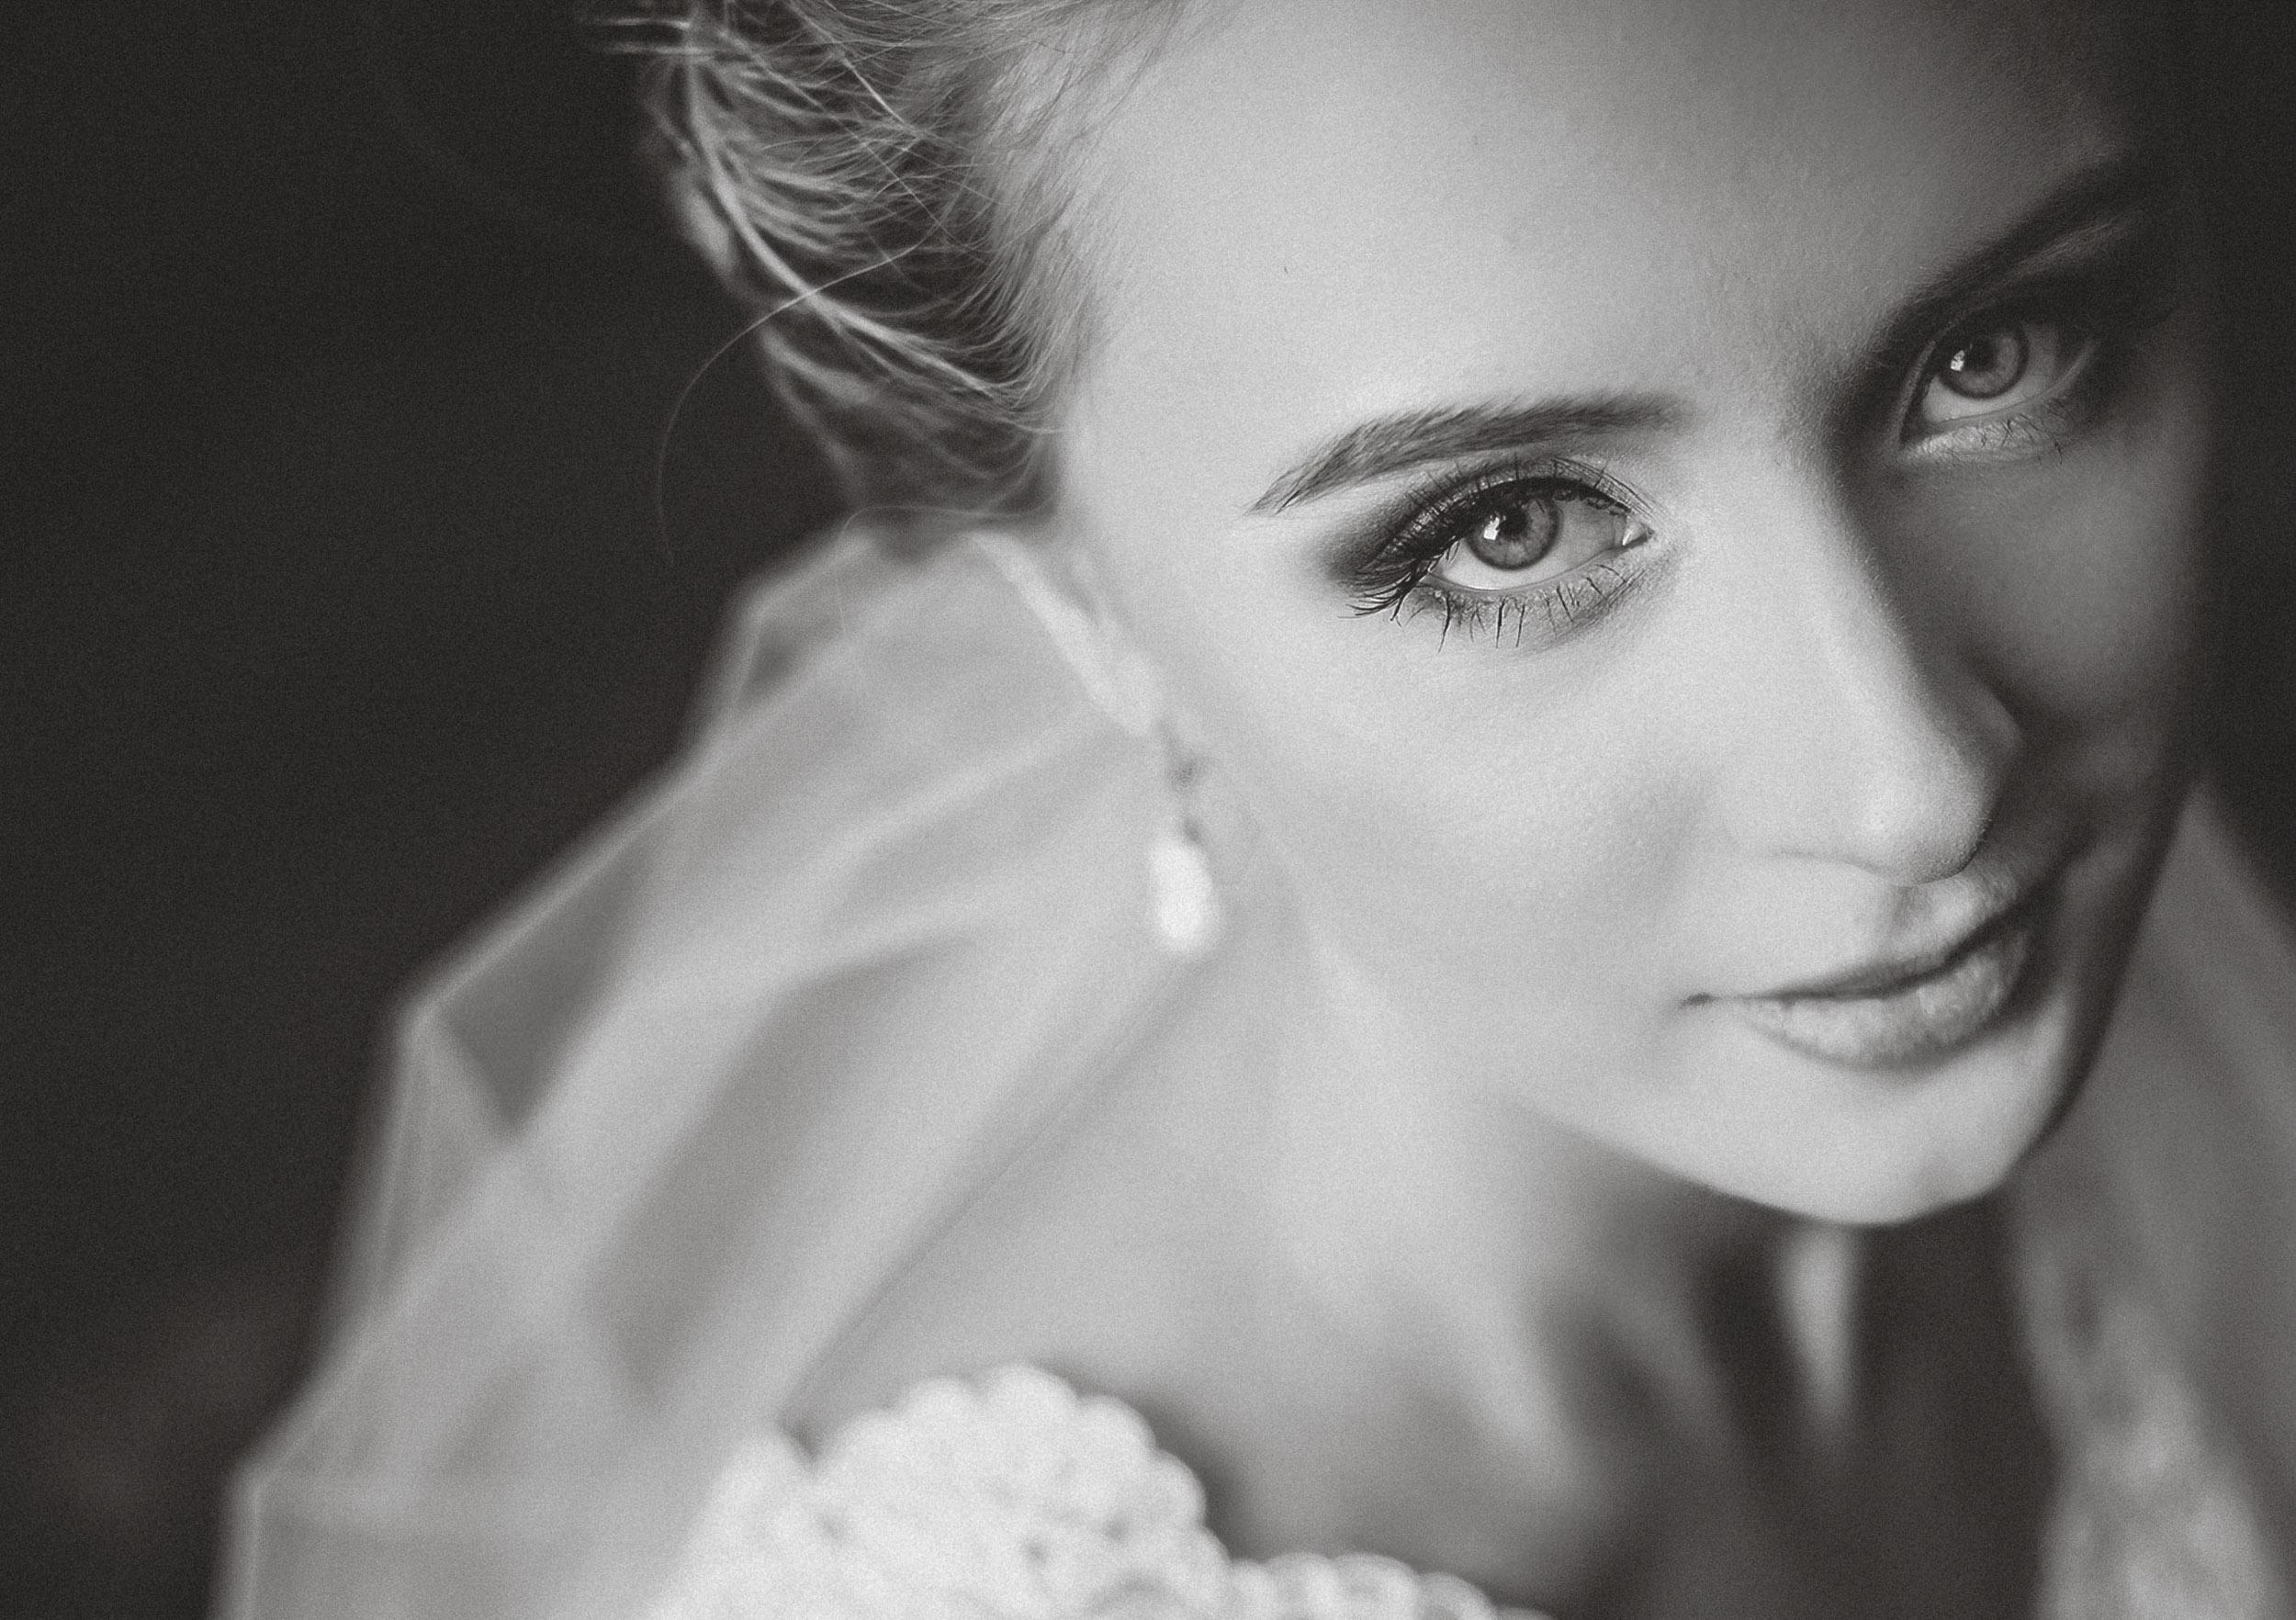 hochzeitsfotografie-schweiz_wedding-photographer-switzerland-europe_Bendik-Photography-033